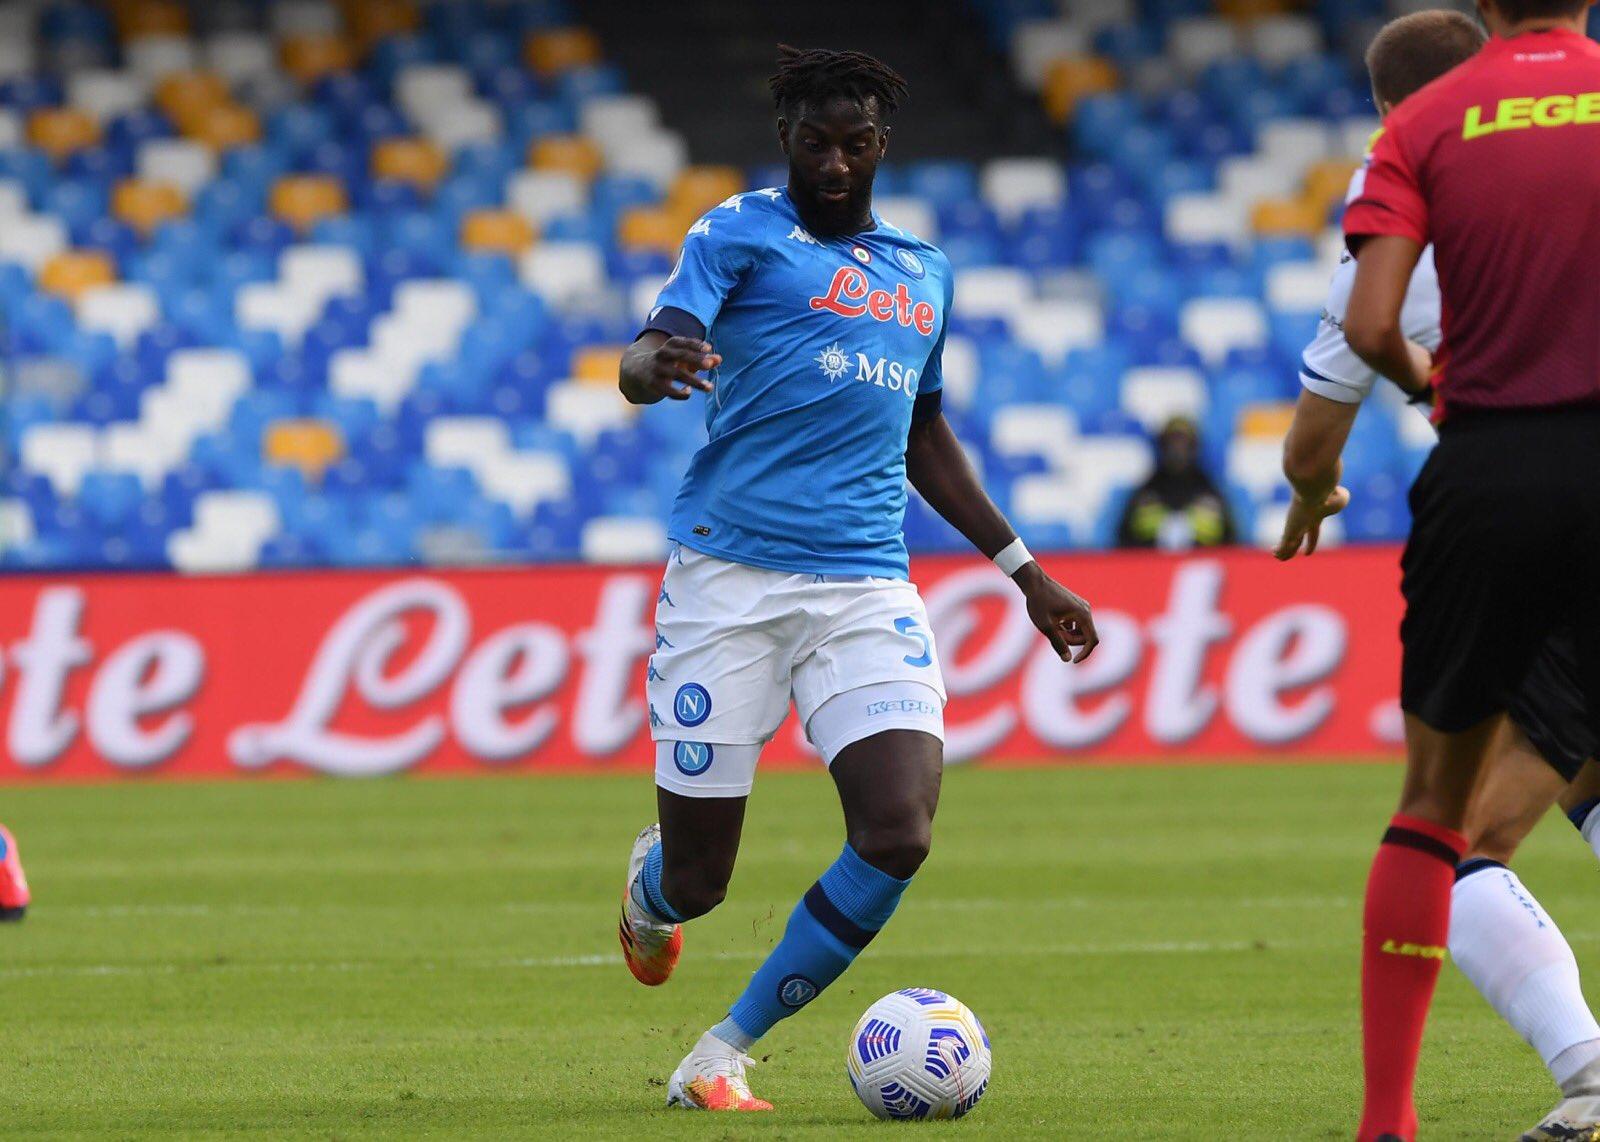 Real Sociedad-Napoli formazioni: Demme e Bakayoko in mediana (con Lobotka), davanti Petagna